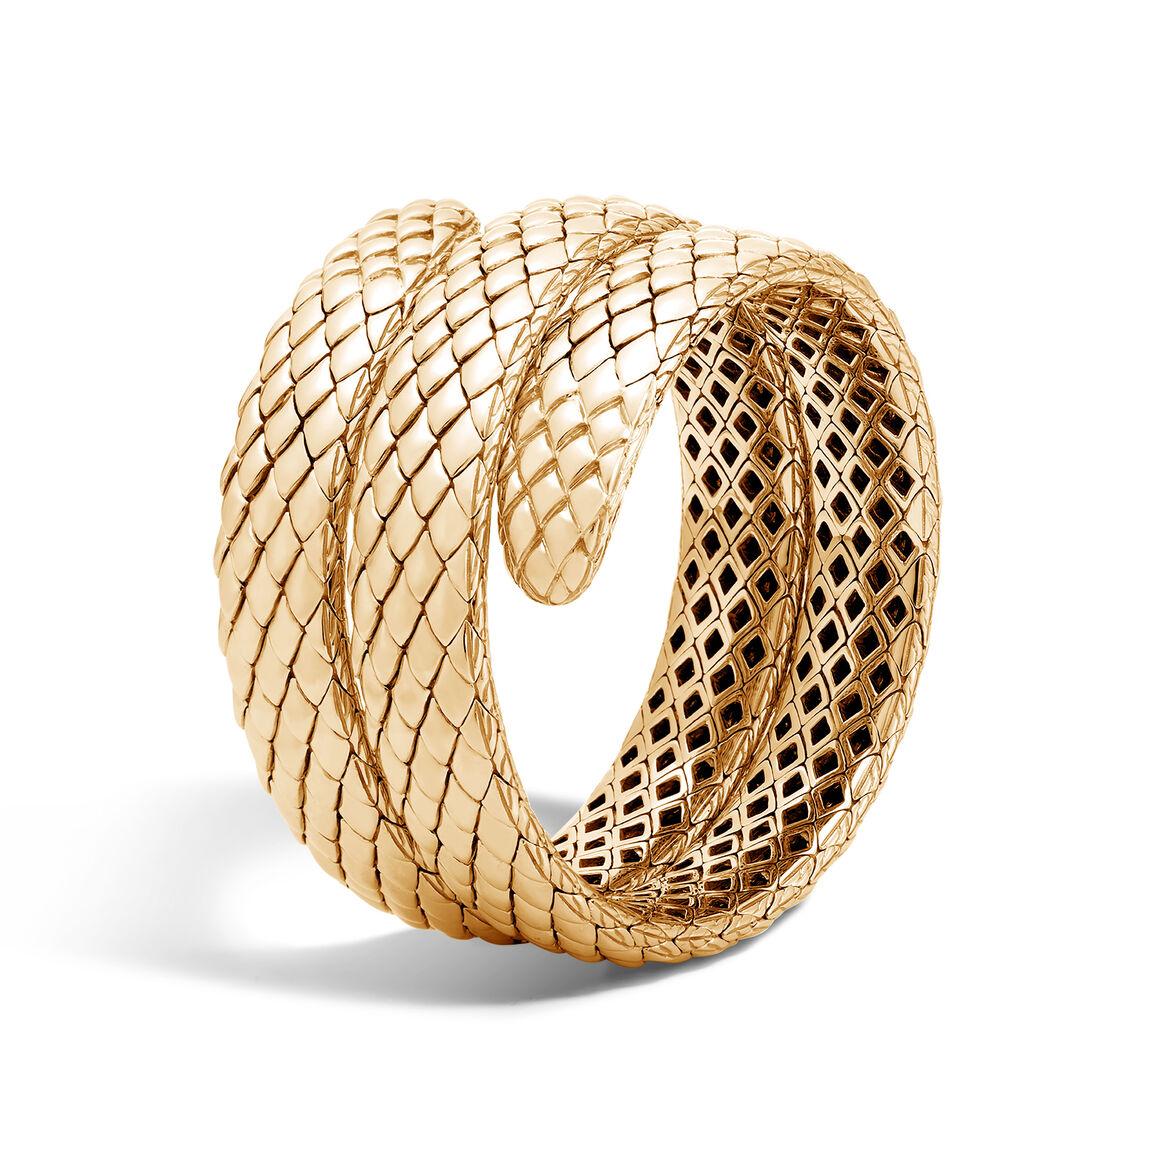 Legends Cobra Coil Bracelet in 18K Gold